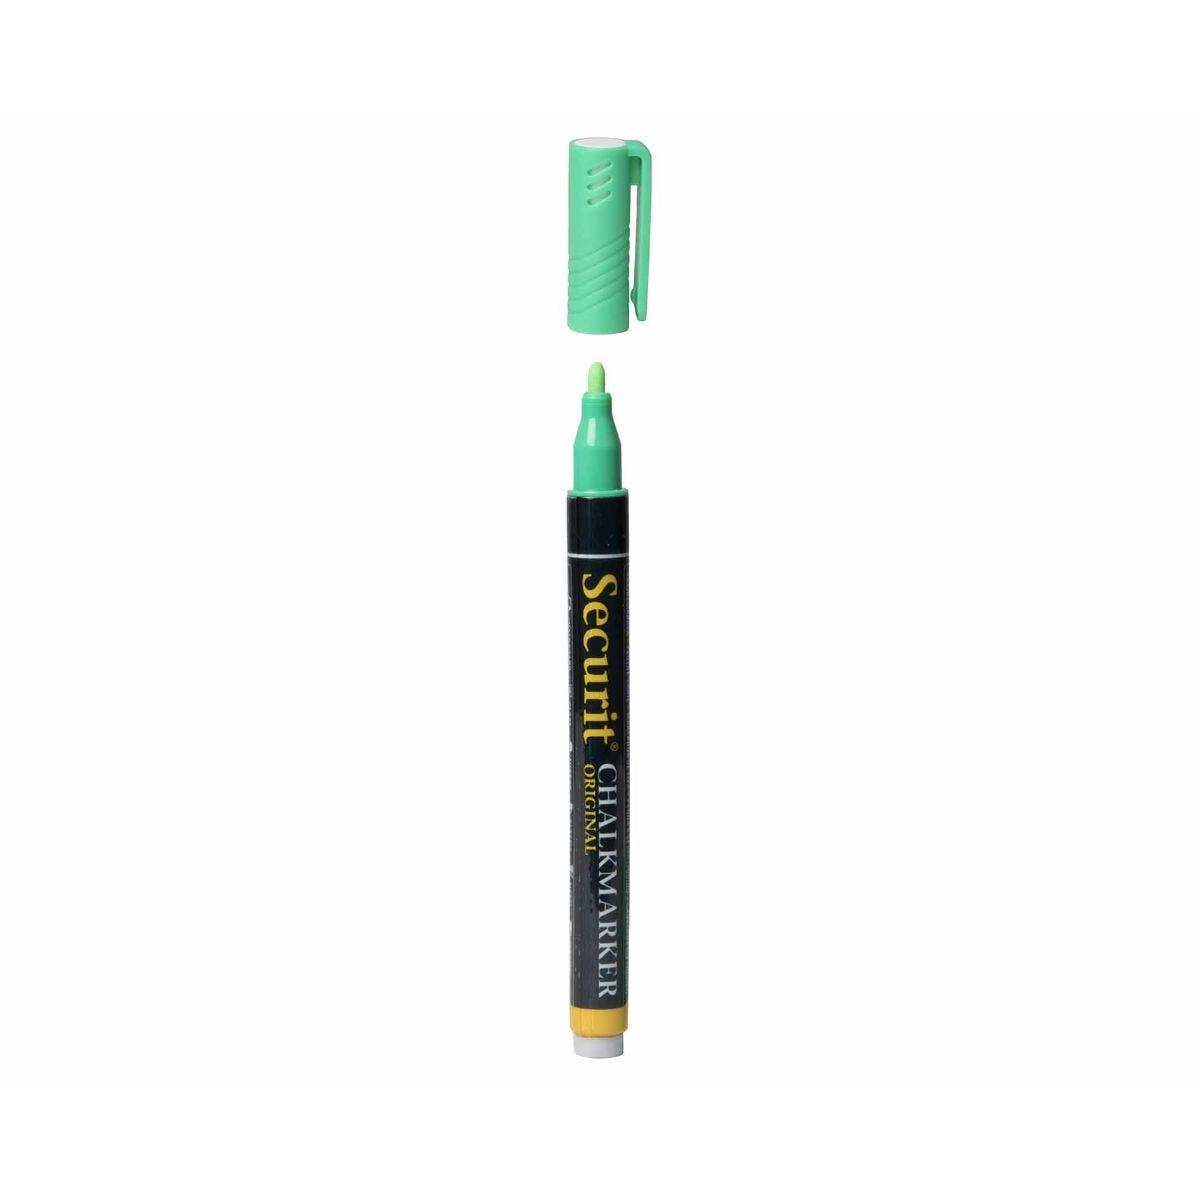 securit liquid chalk marker small, green